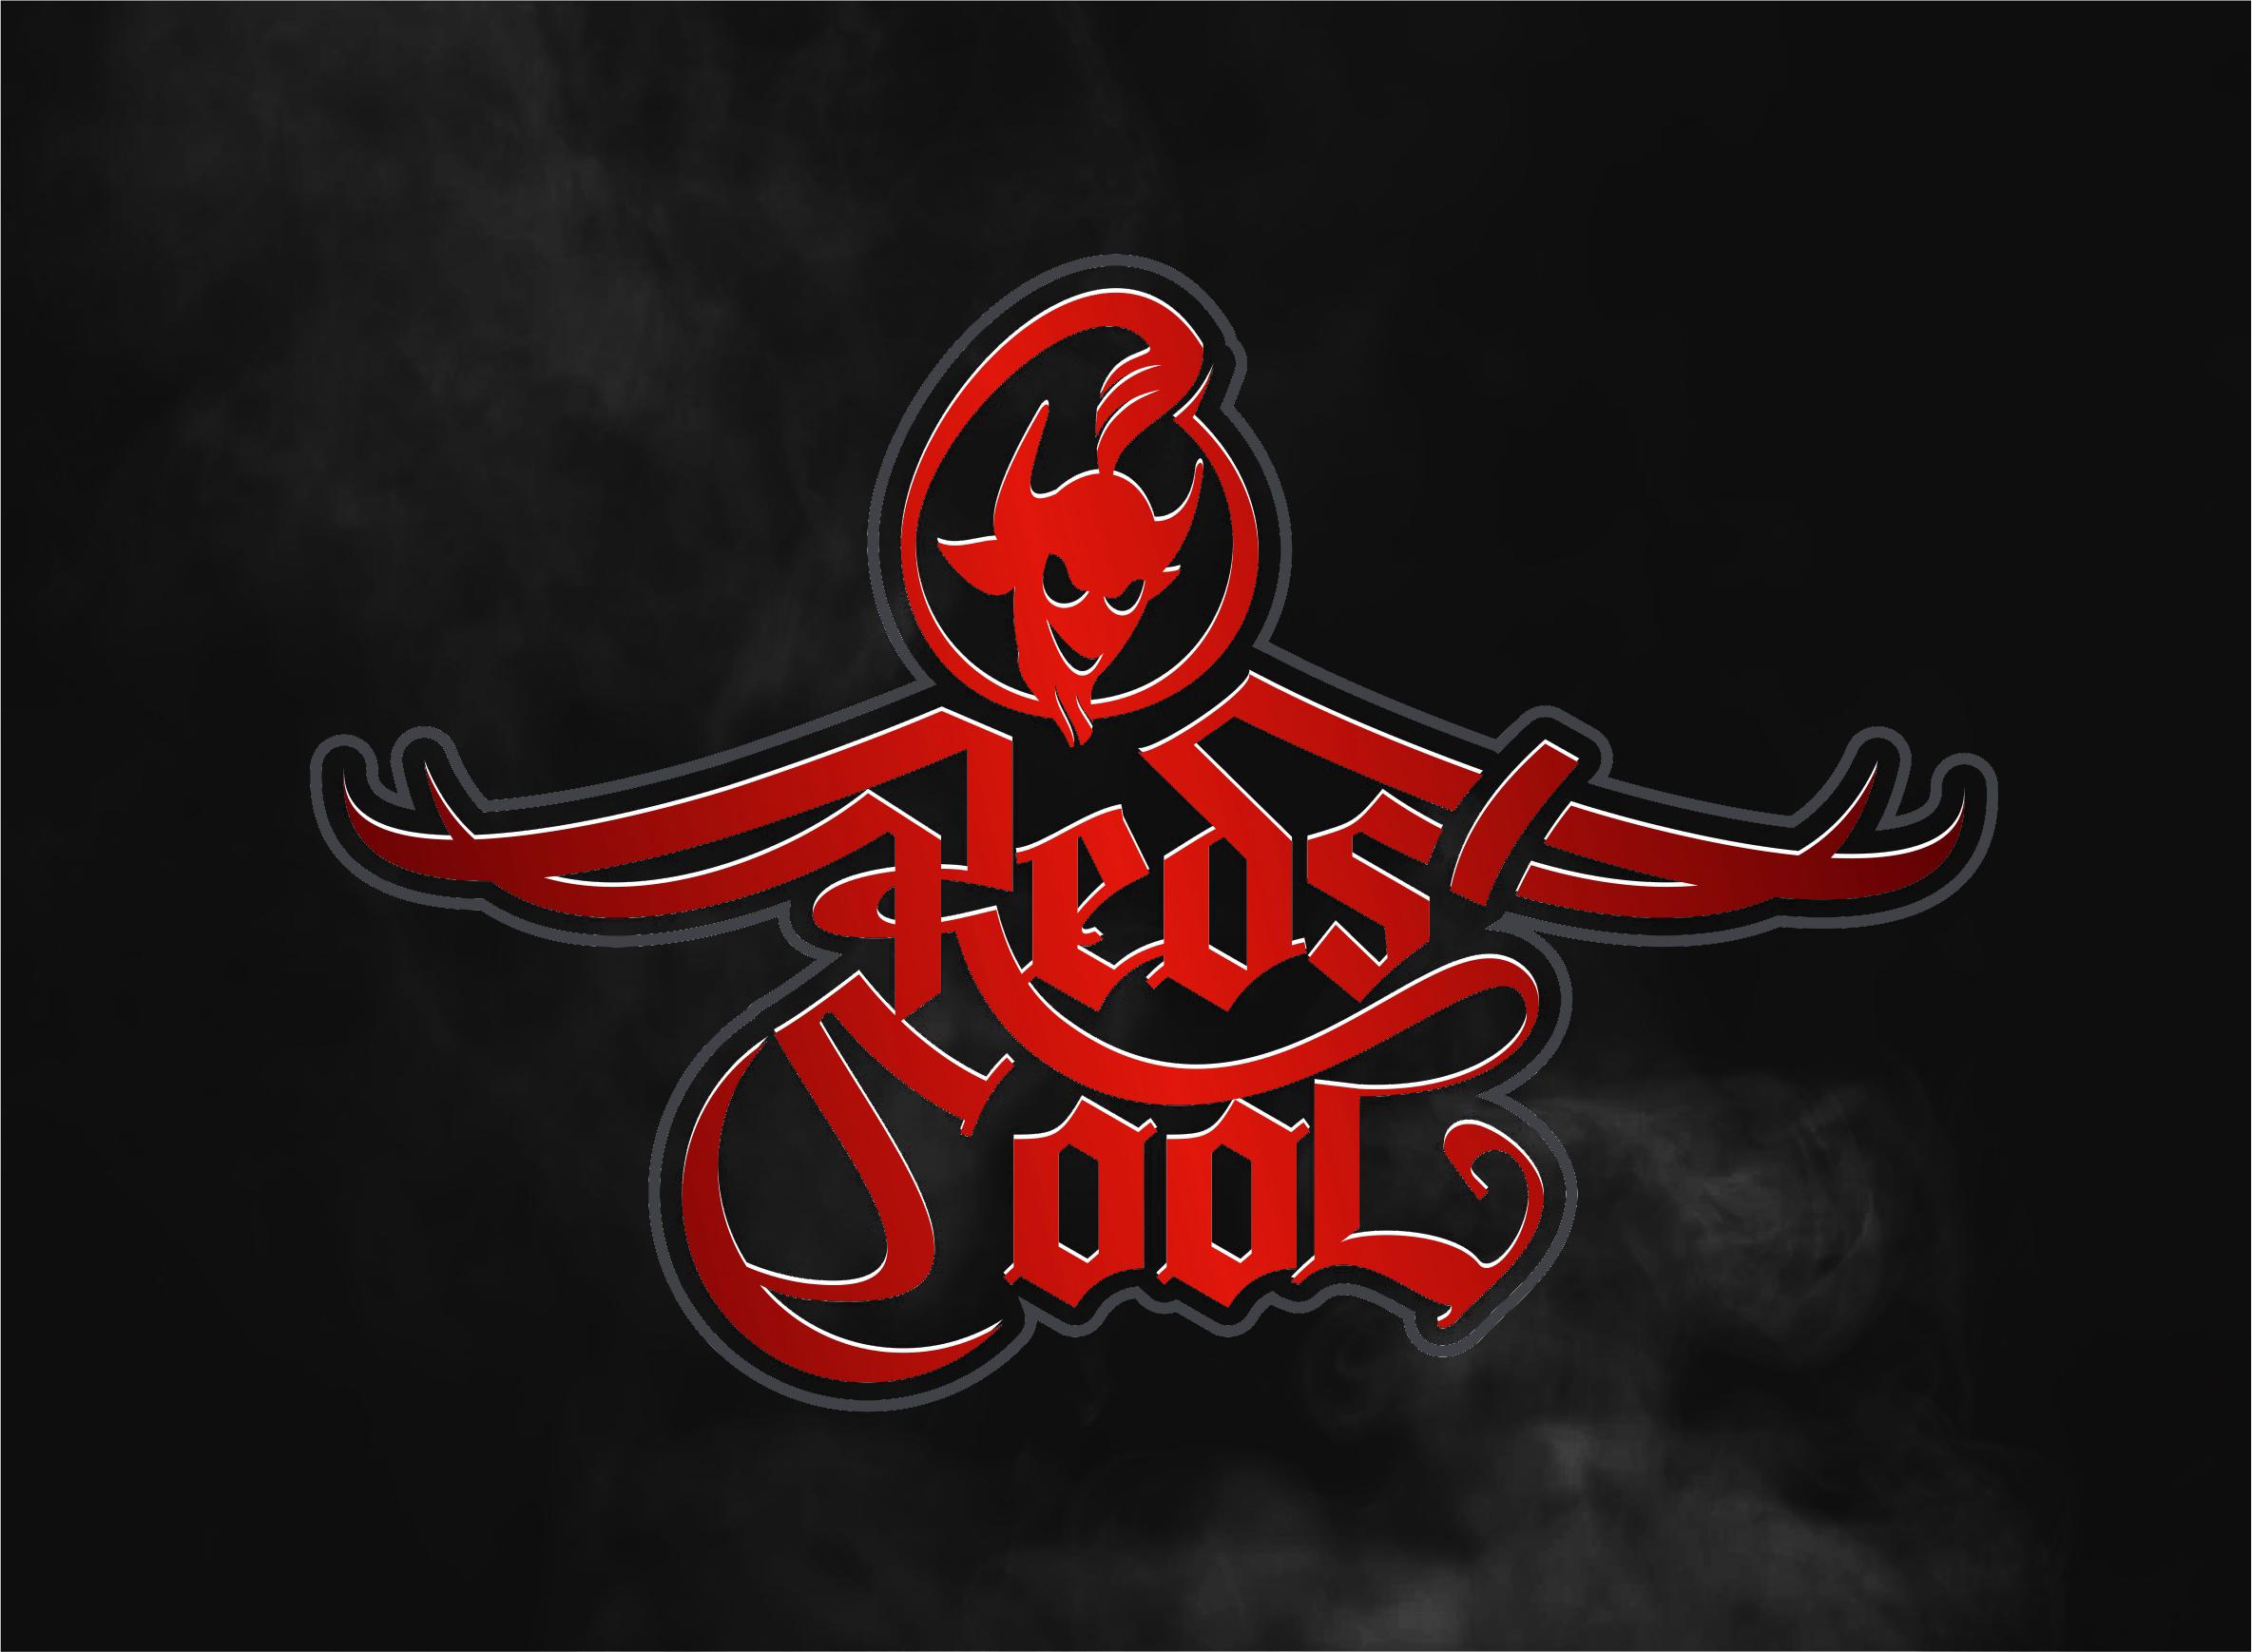 Логотип для музыкальной группы фото f_9135a4fbf7ae3bcc.jpg